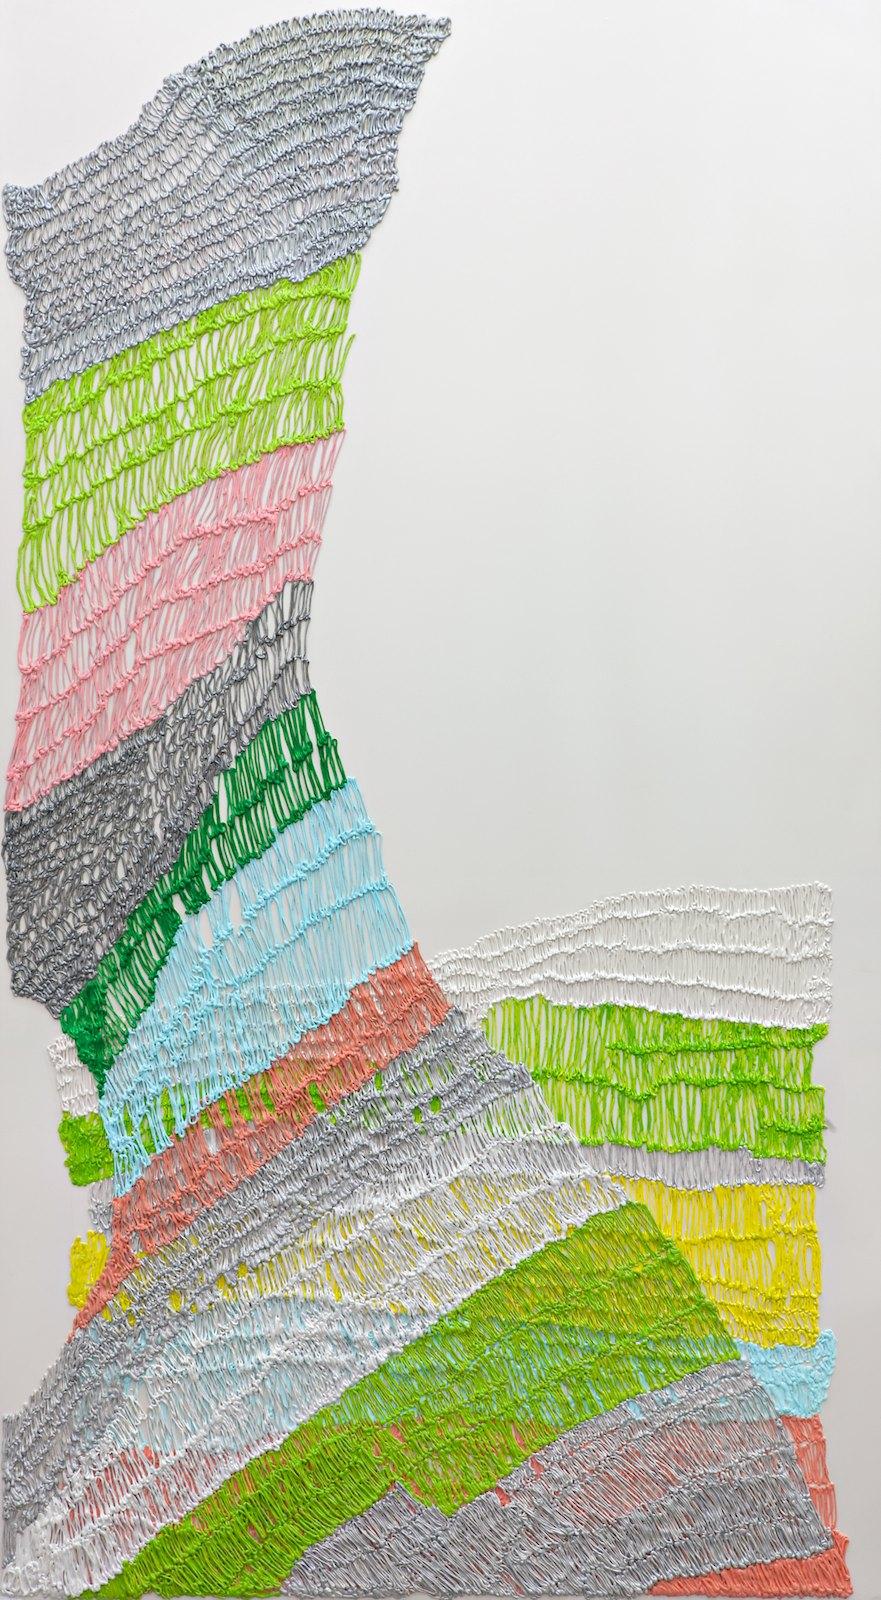 Handmade # 5, 2011-2012, acrylic on alucore, 220 x 120 cm